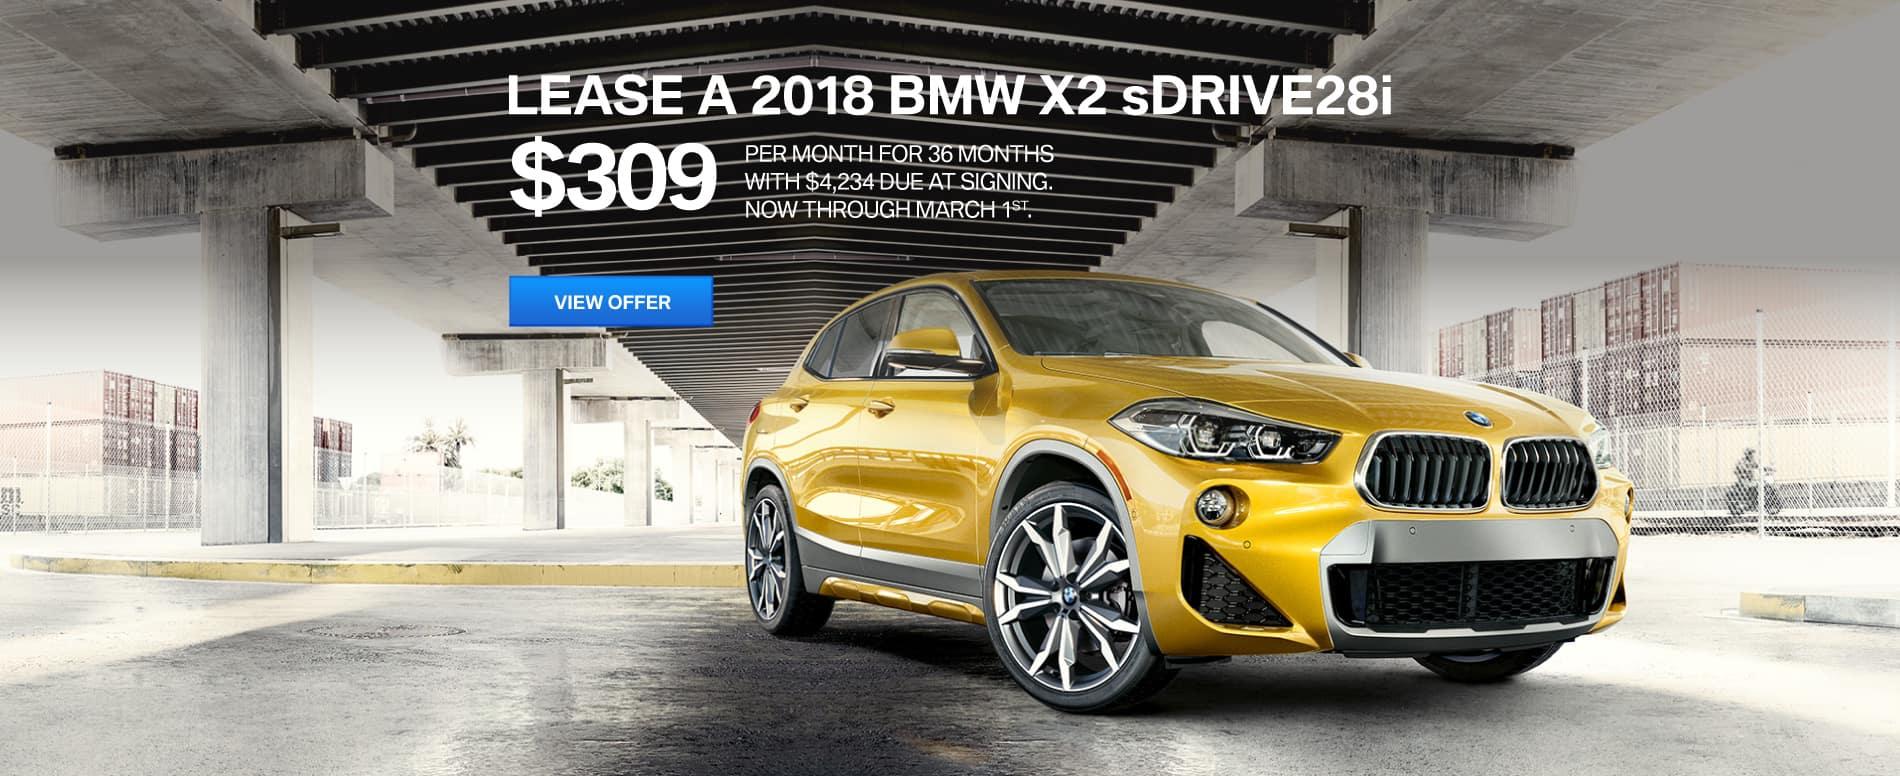 Autobahn BMW X2 Lease | $309